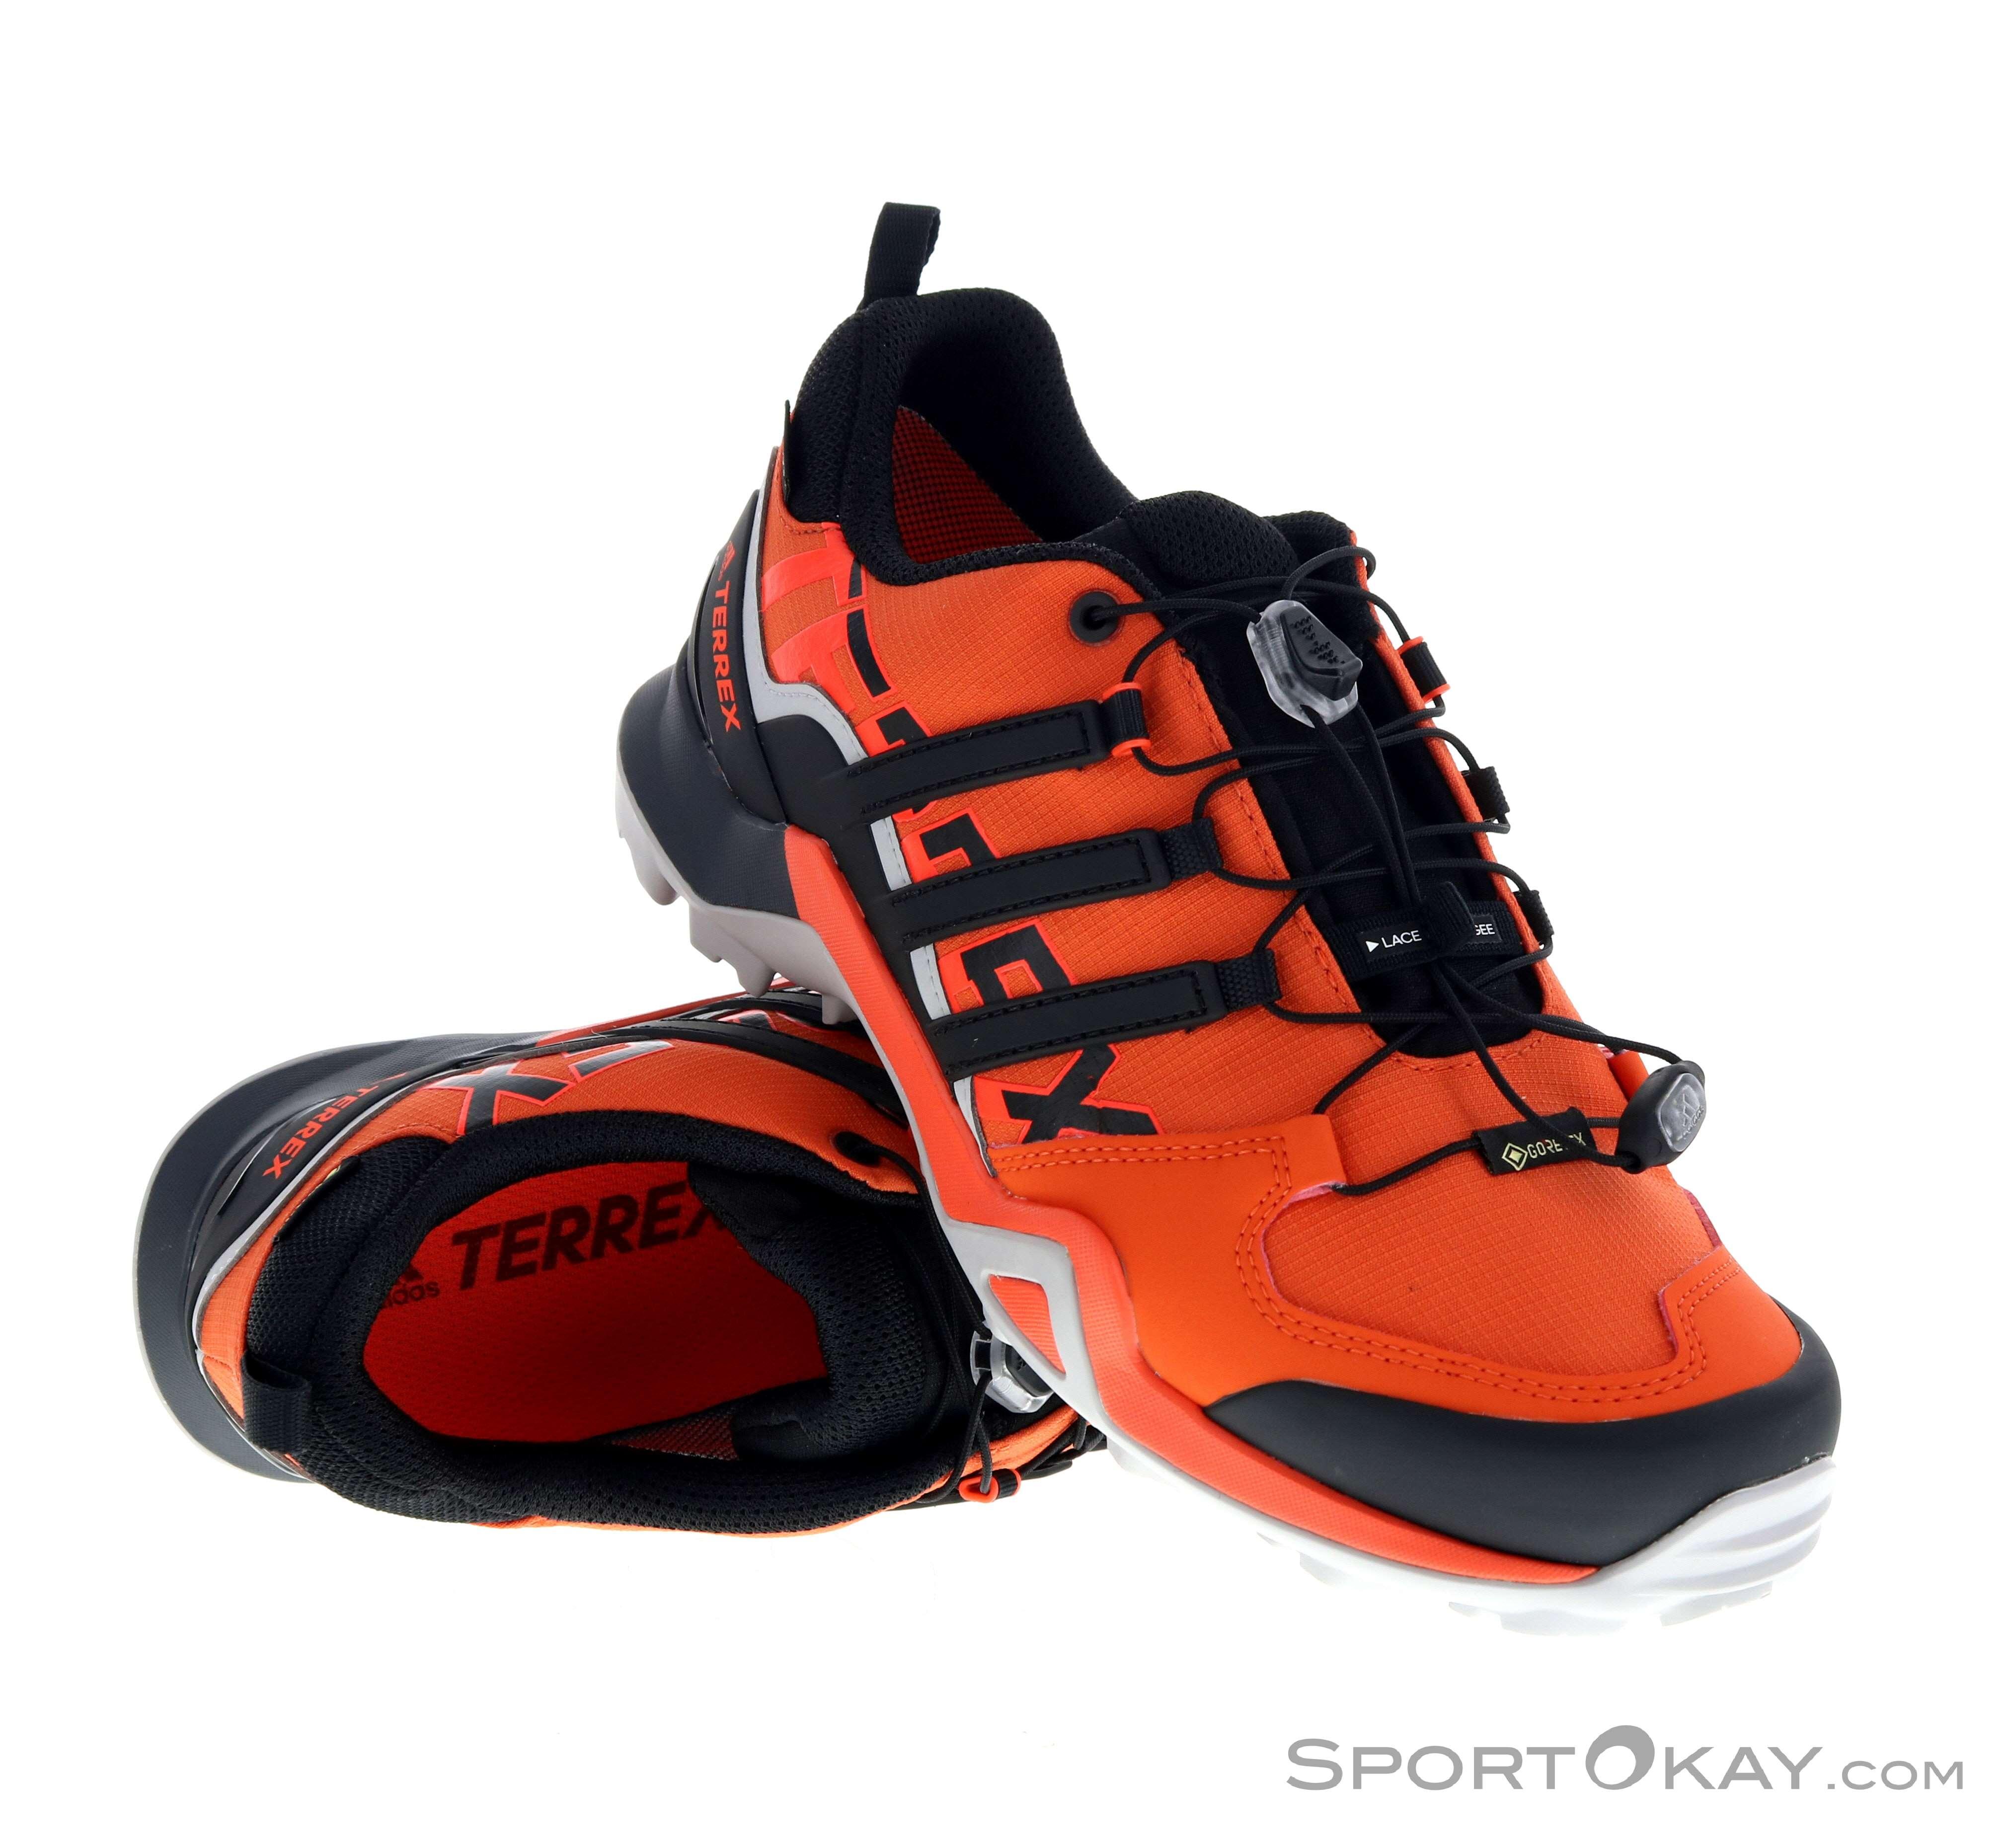 adidas Terrex adidas Terrex Swift R2 Mid GTX Mens Hiking Boots Gore-Tex